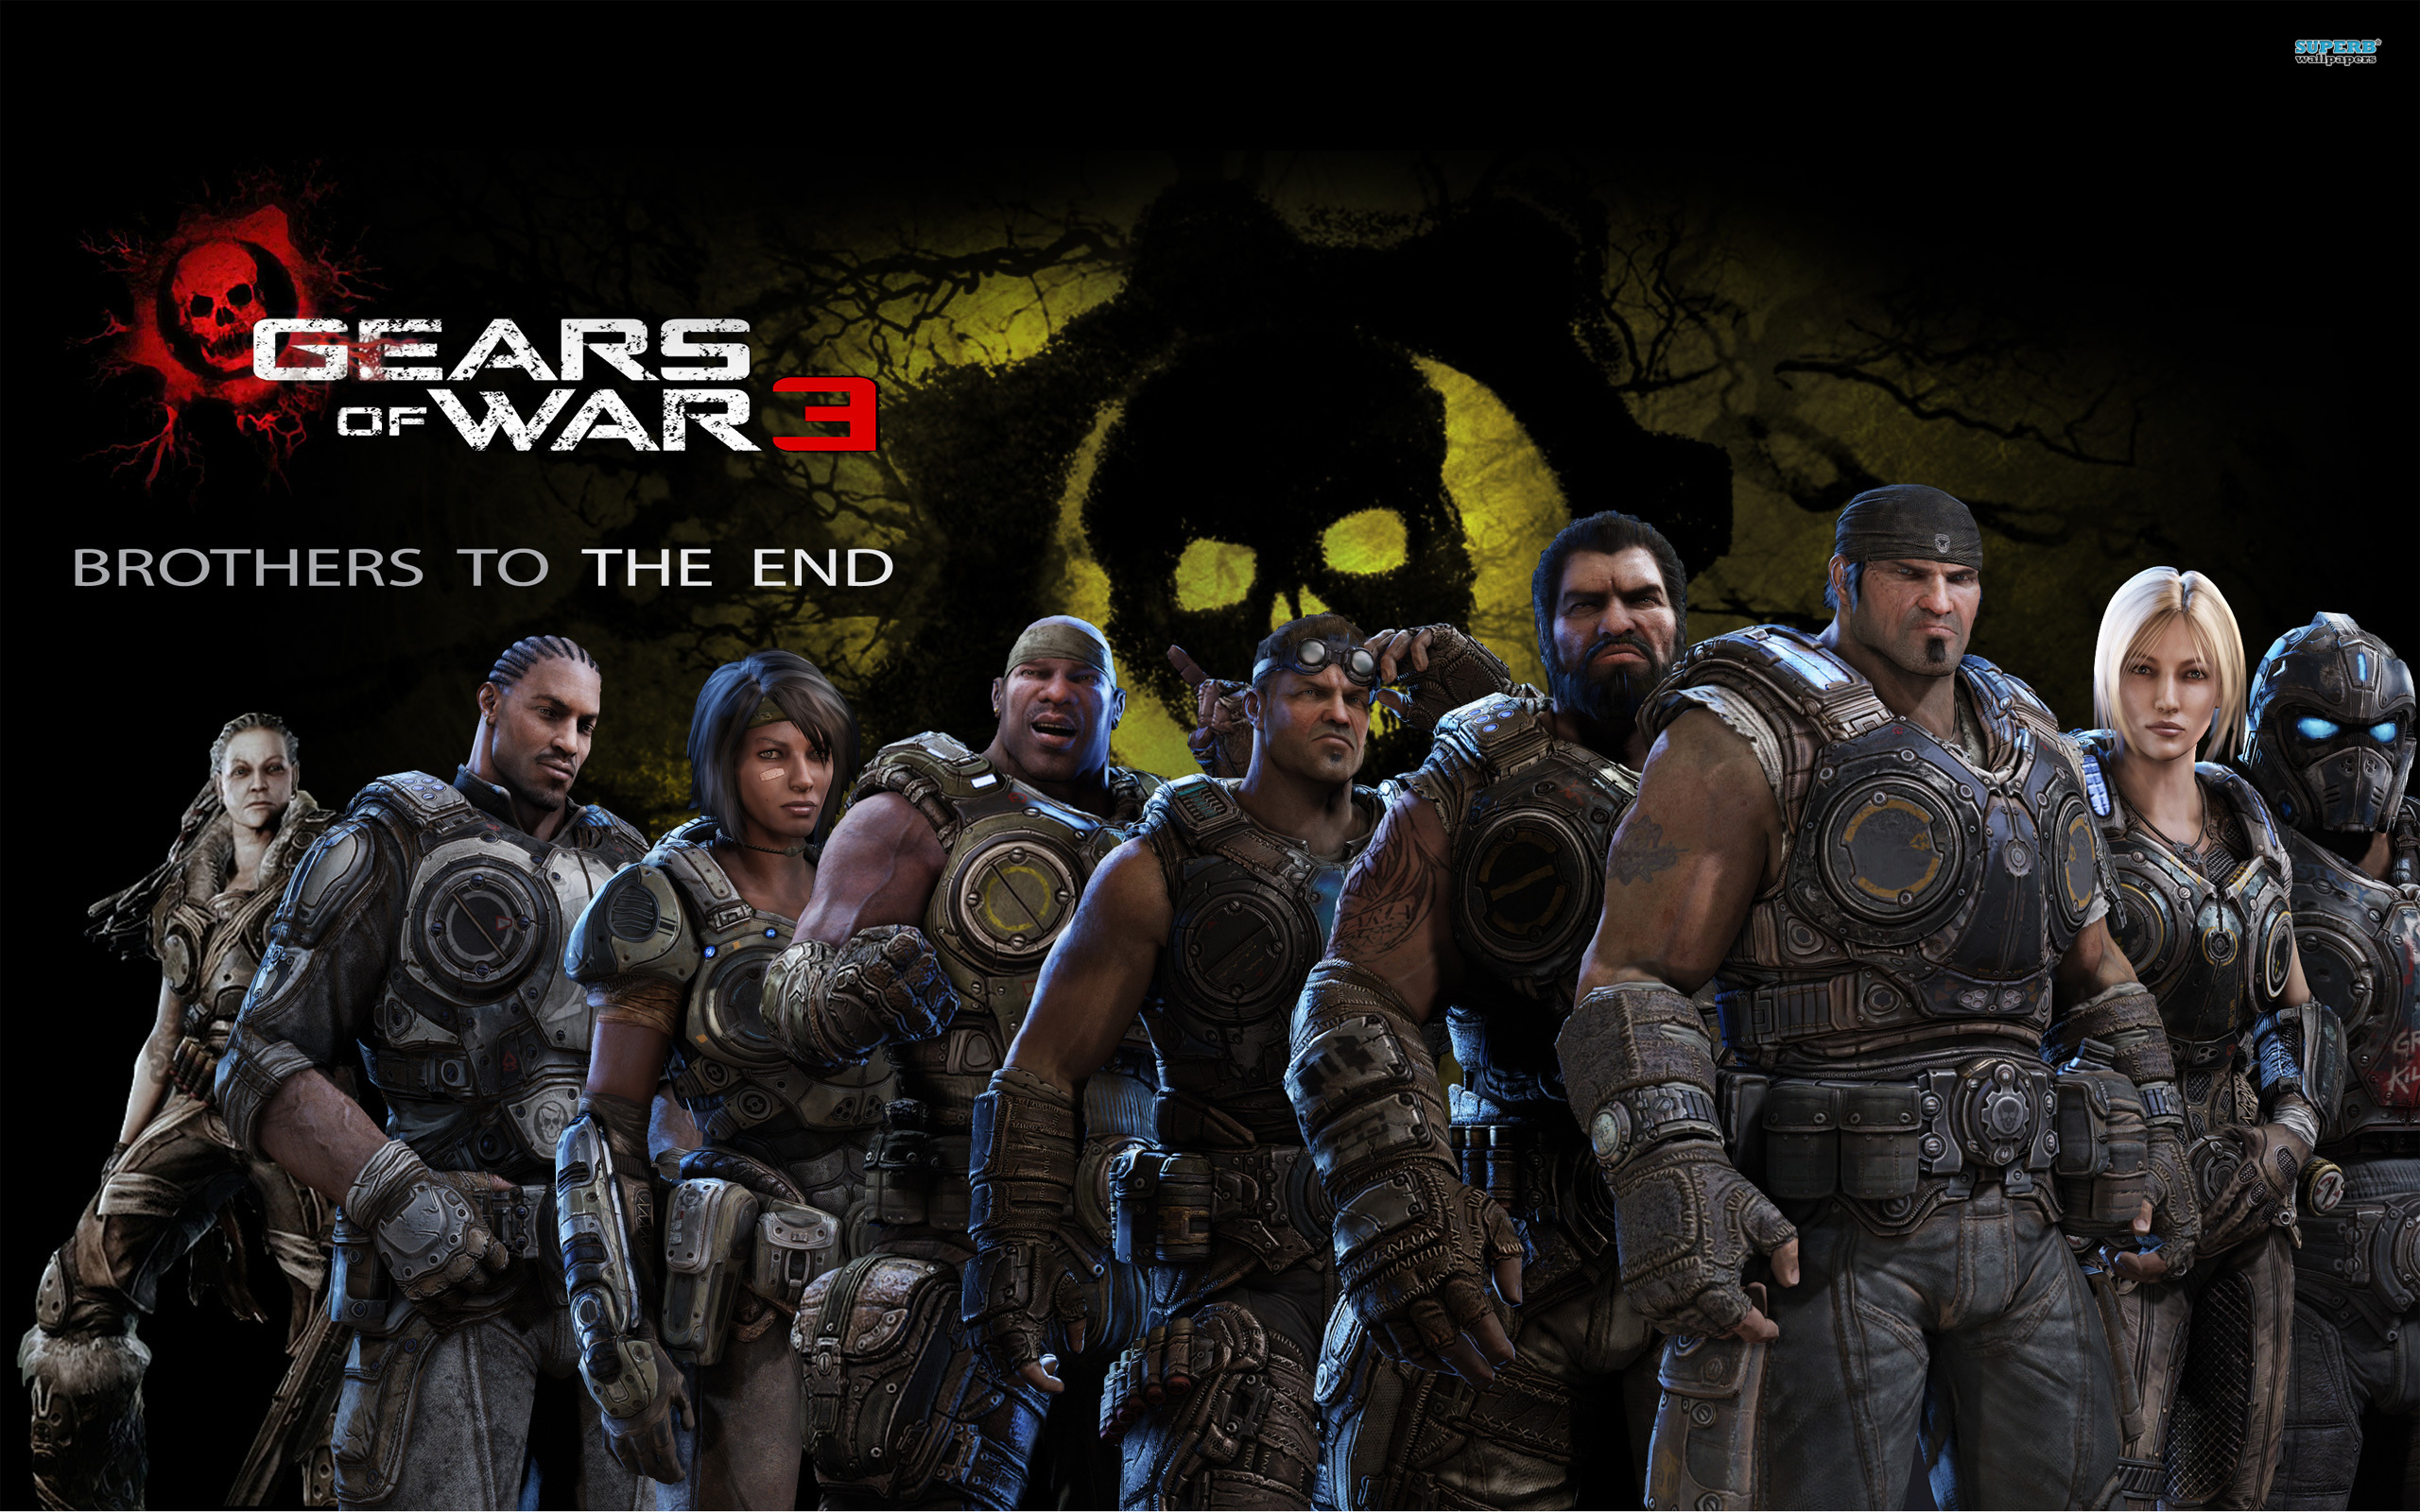 Gears of War 3 wallpaper 2560x1600 jpg